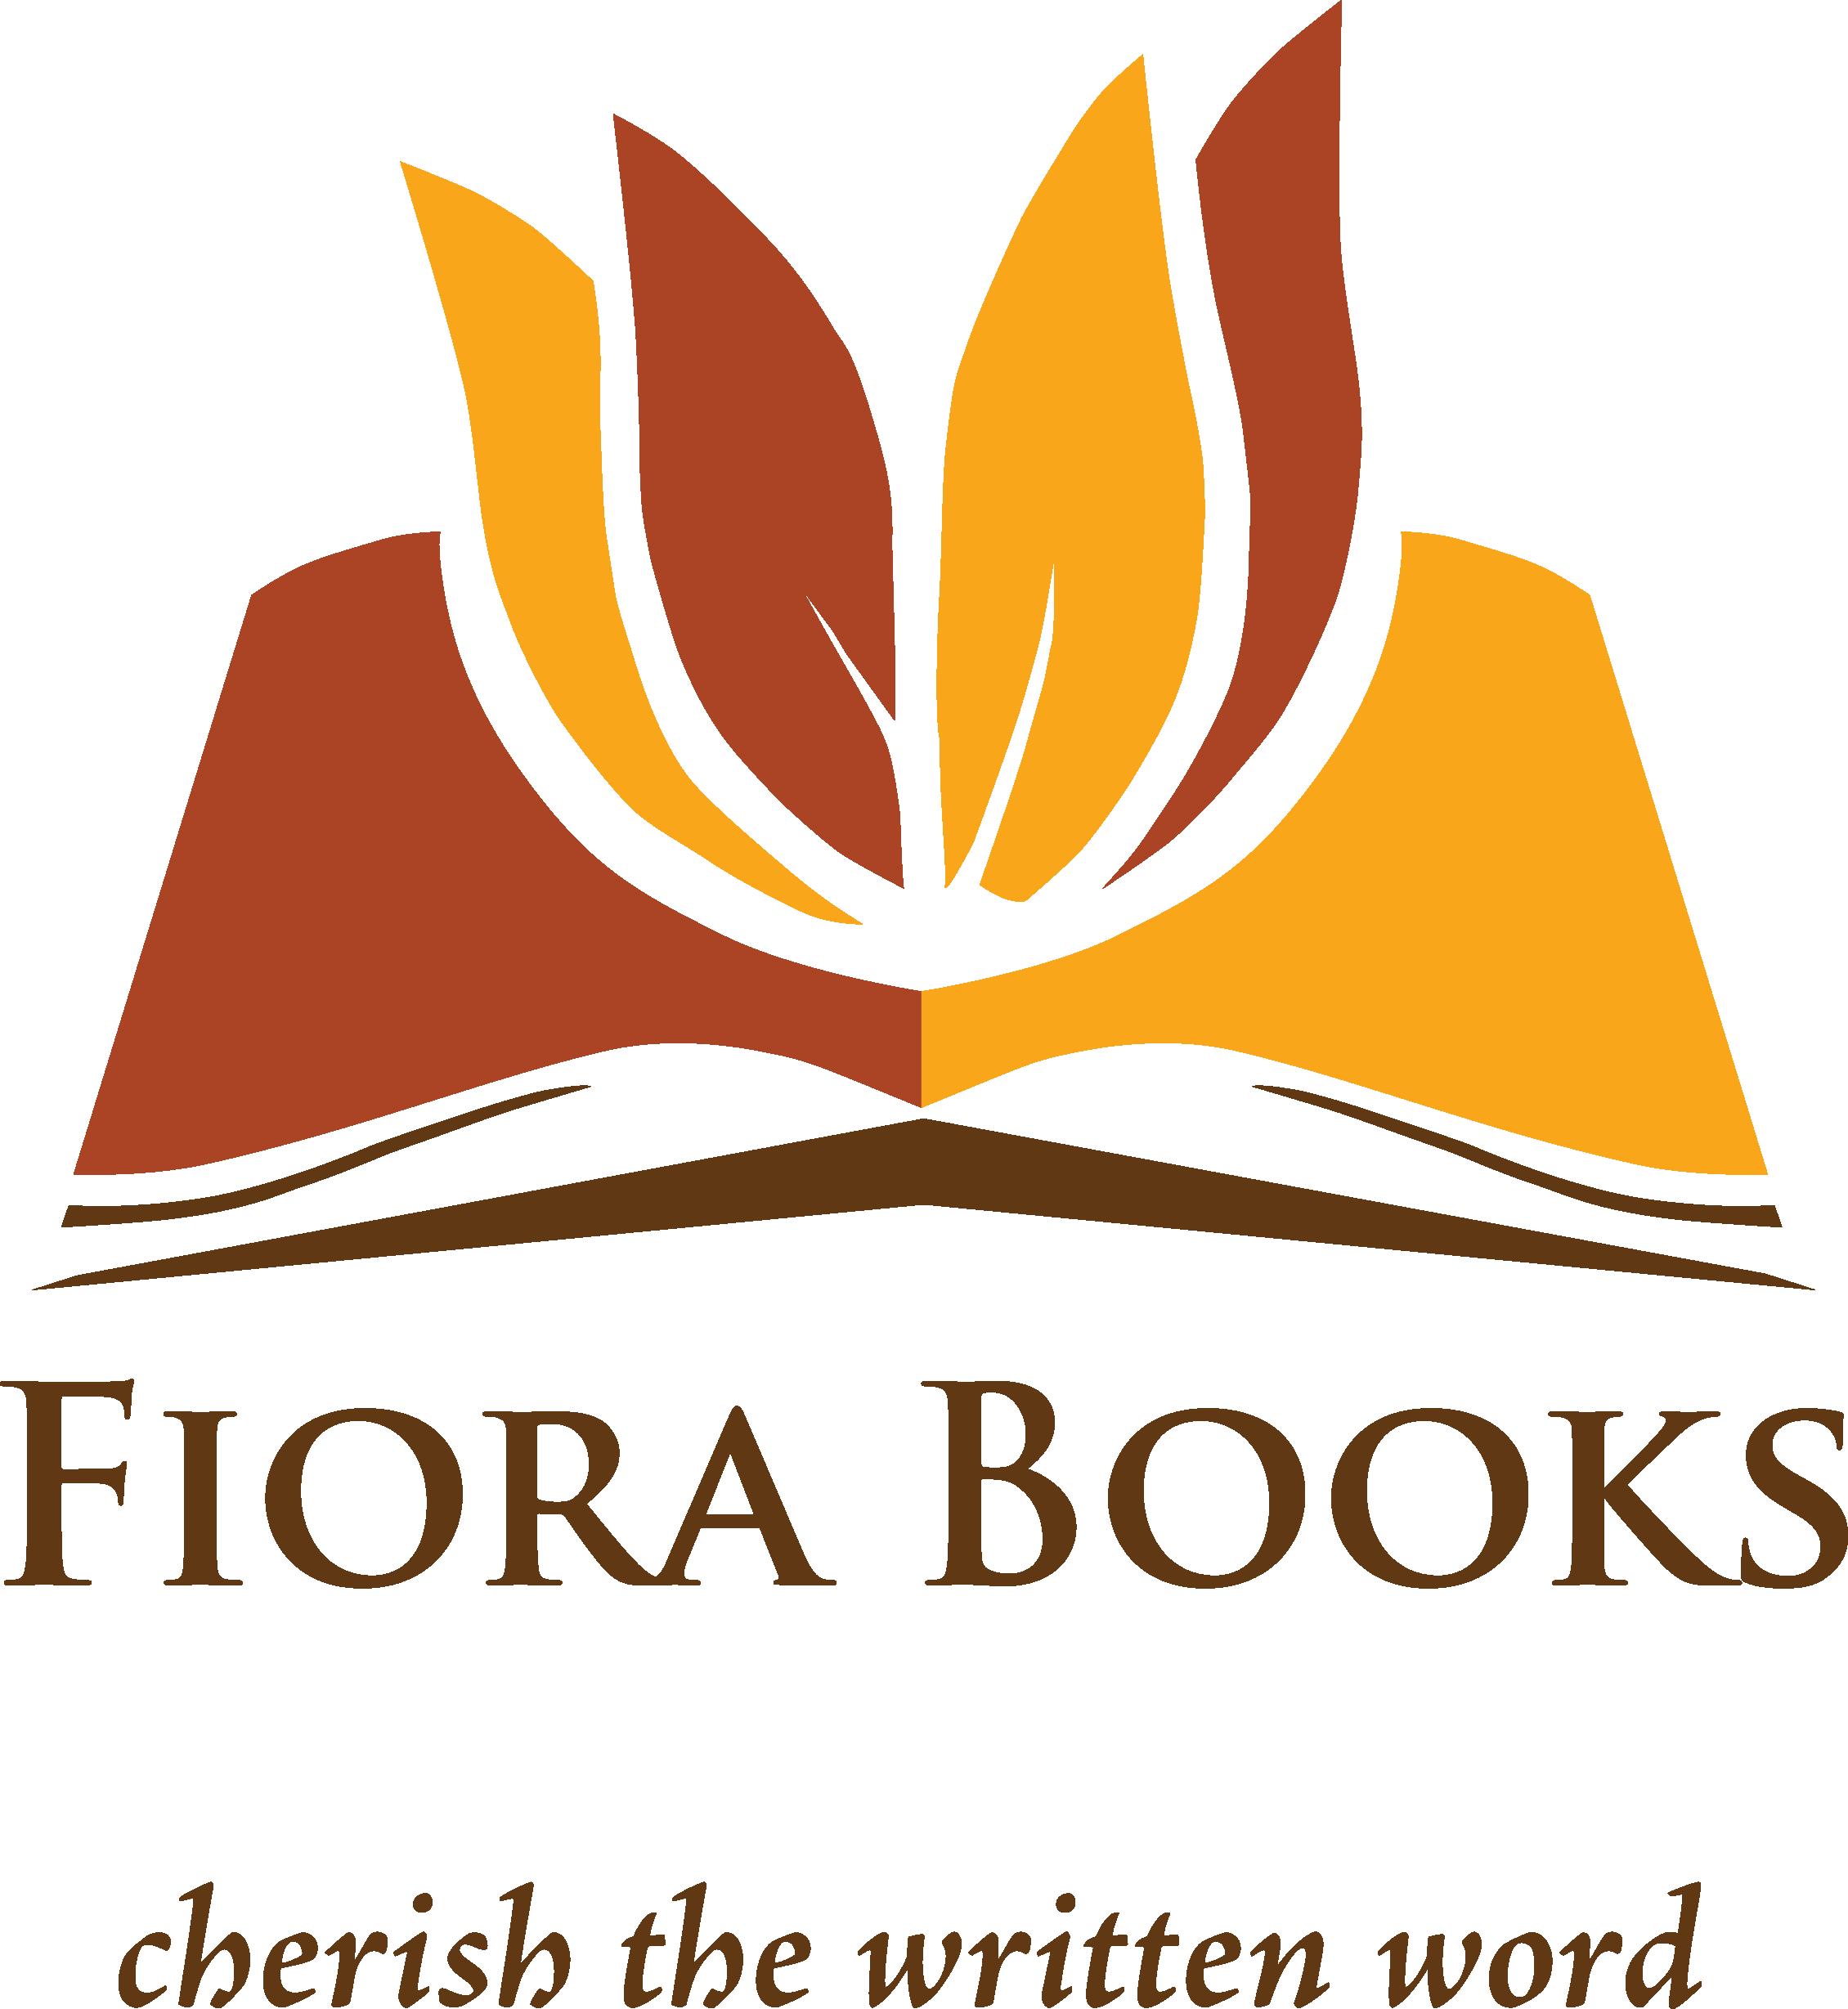 Fiora-Books-Logo-print.png (2260×2457)